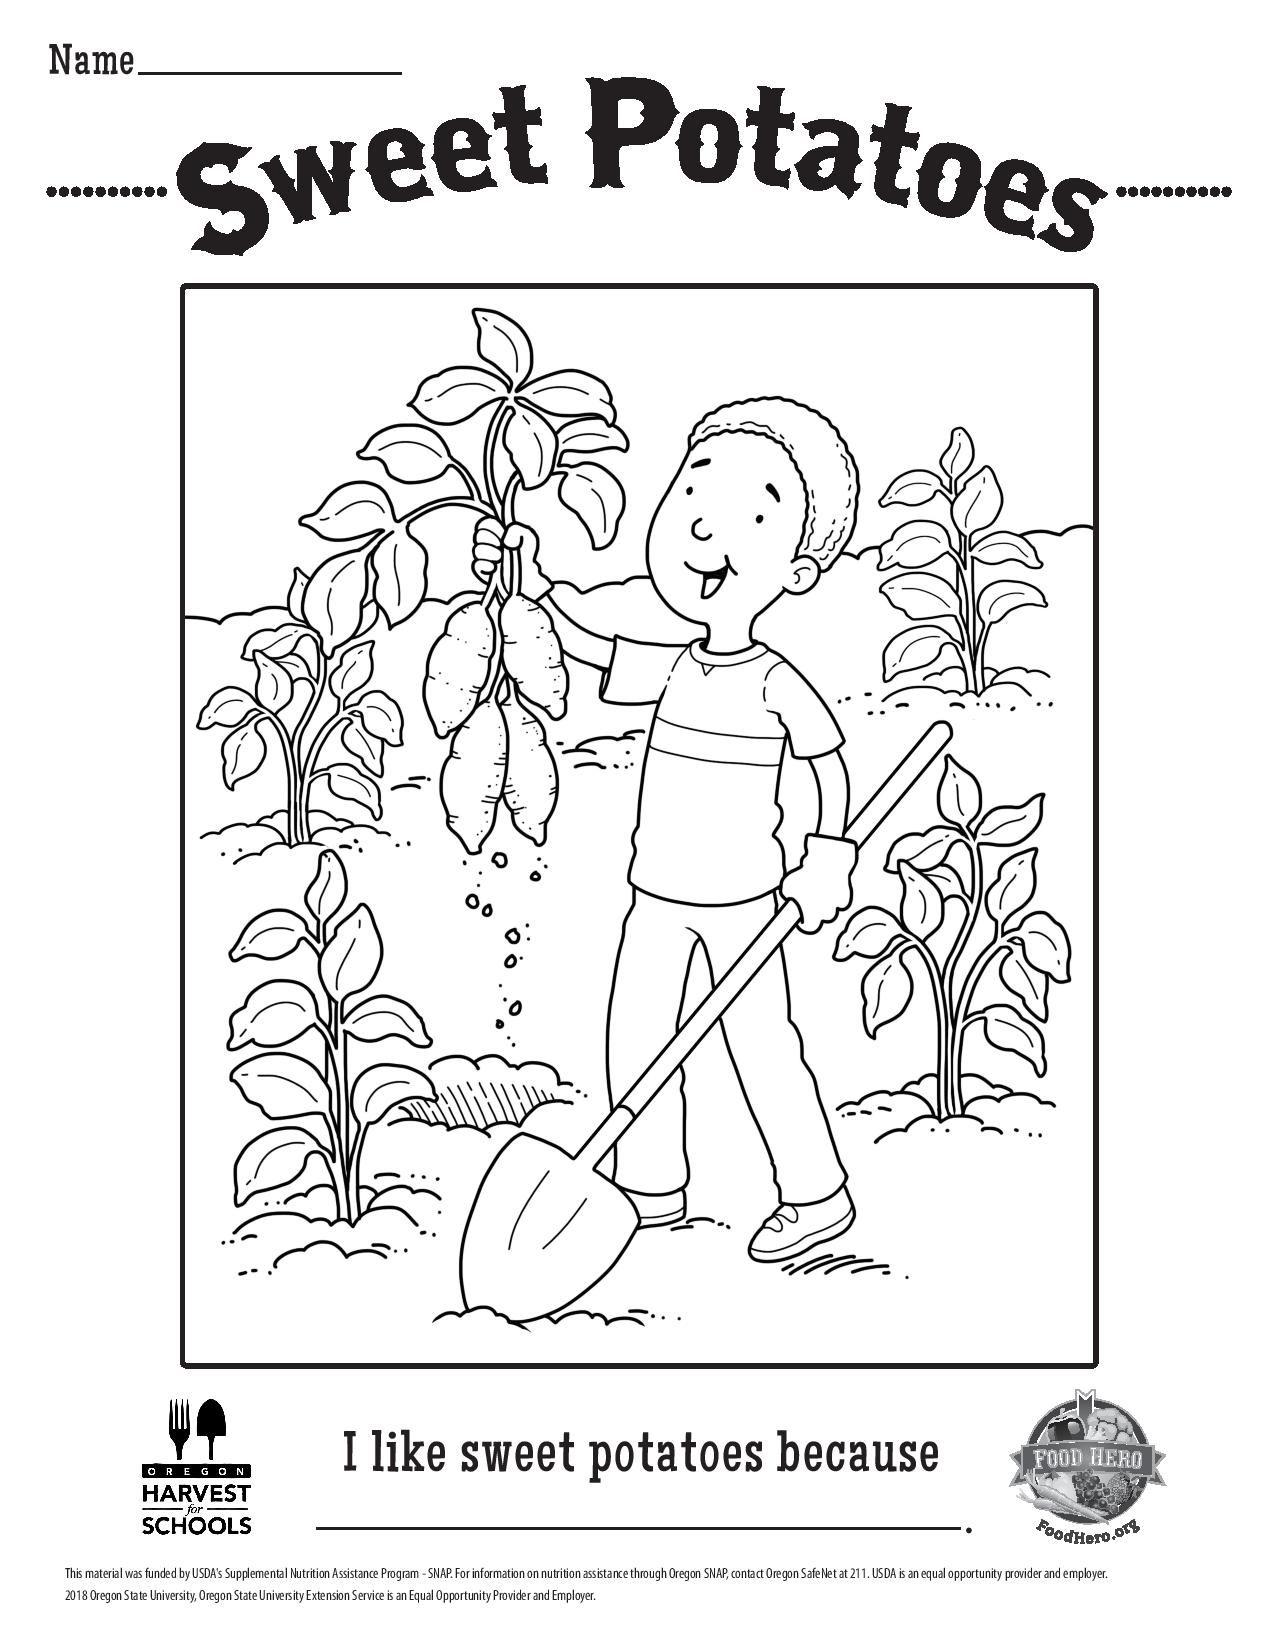 Printable Vegetable Potato Coloring Page Printable Coloring